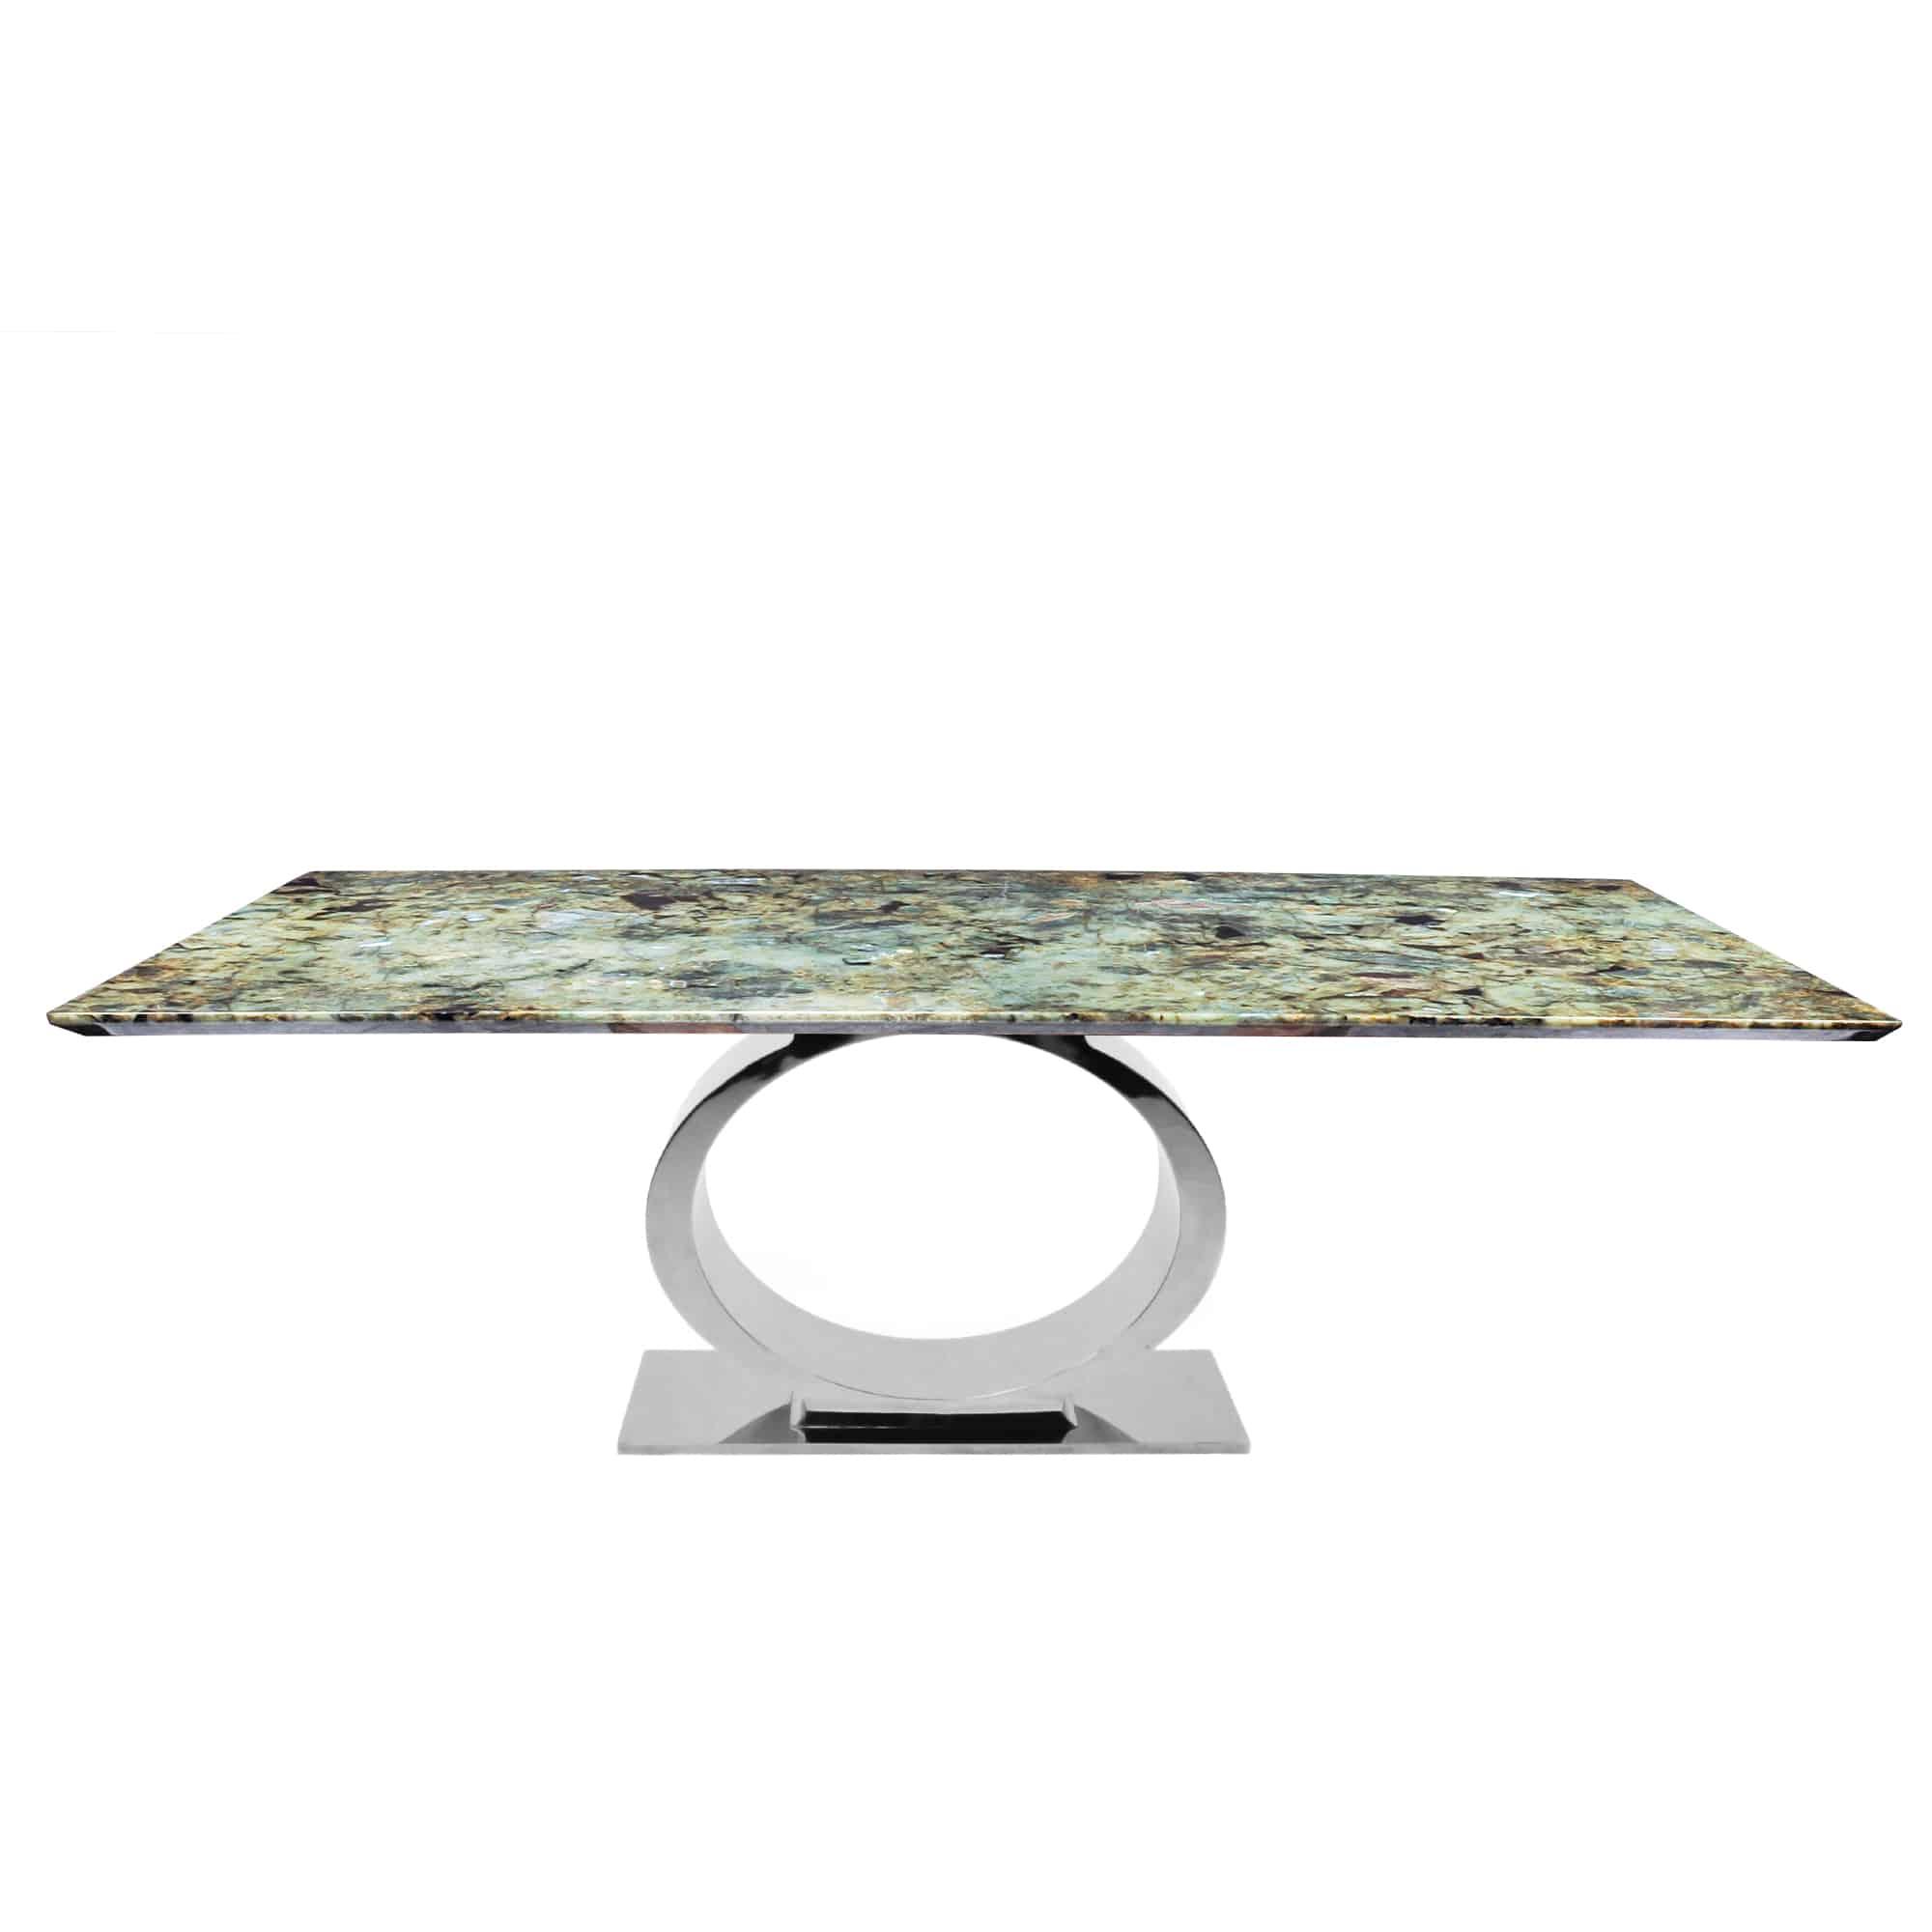 Strange Decasa Rectangular Granite Dining Table Blue Jade Gamerscity Chair Design For Home Gamerscityorg